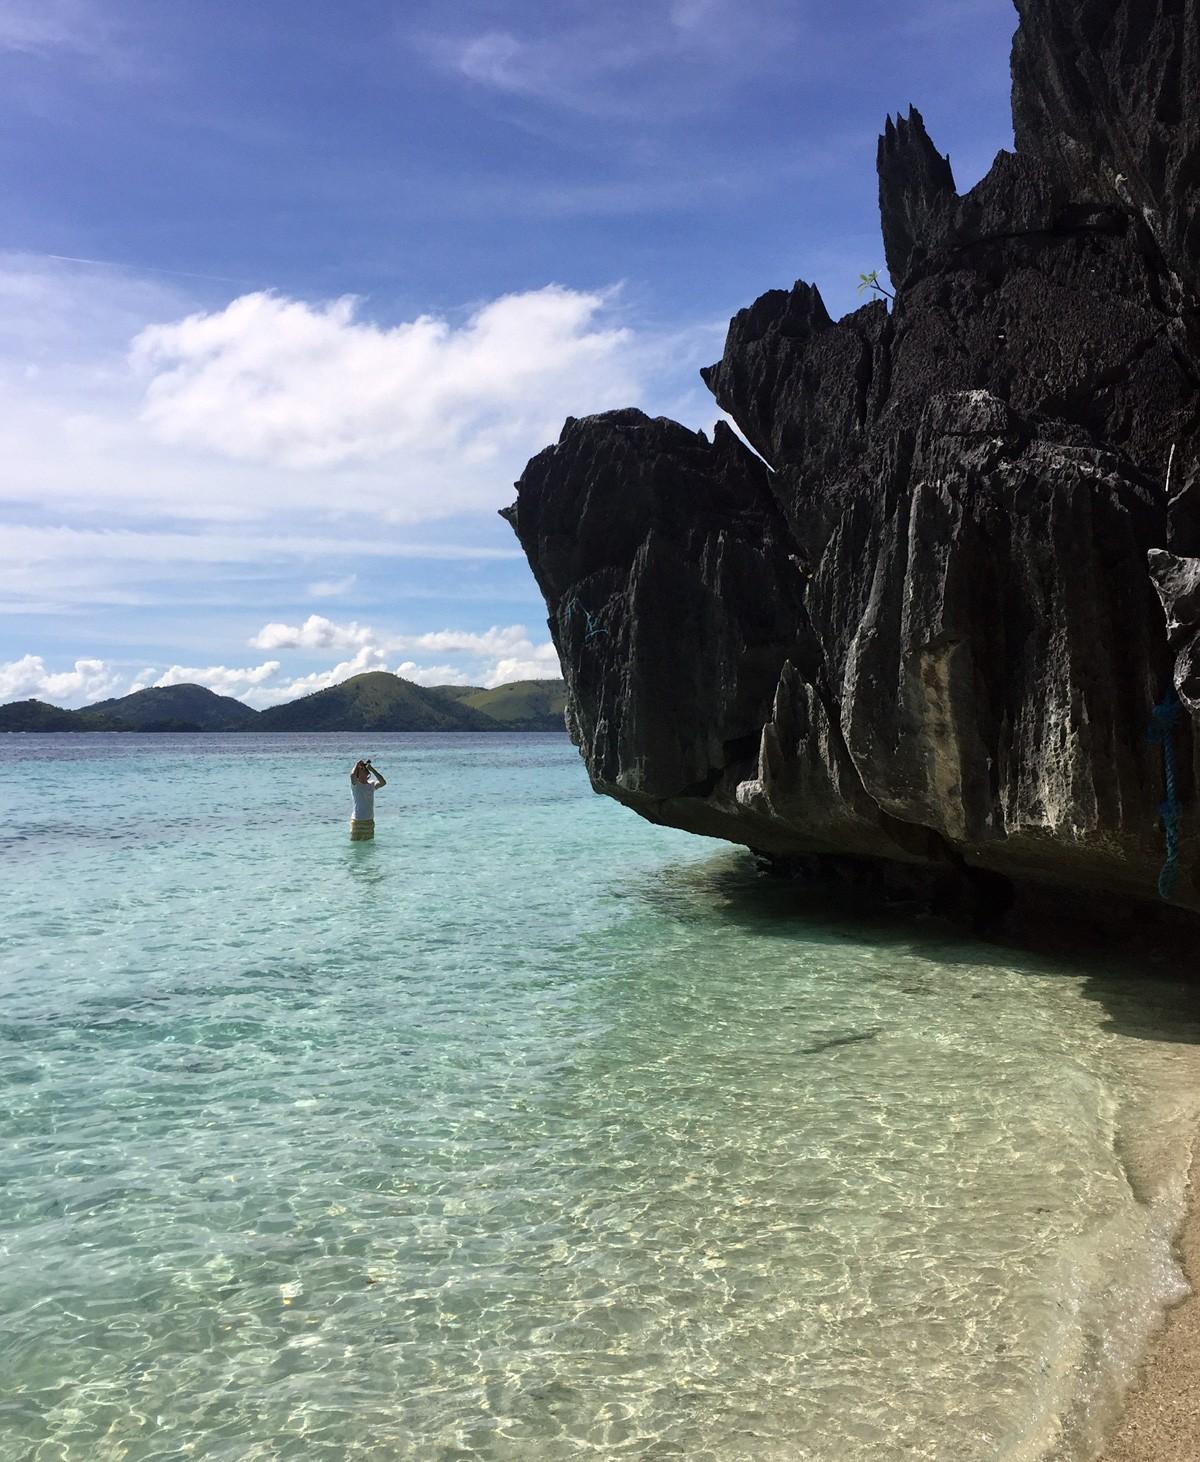 Andrei take a photos on Banol beach, Palawan - Travelblogstories